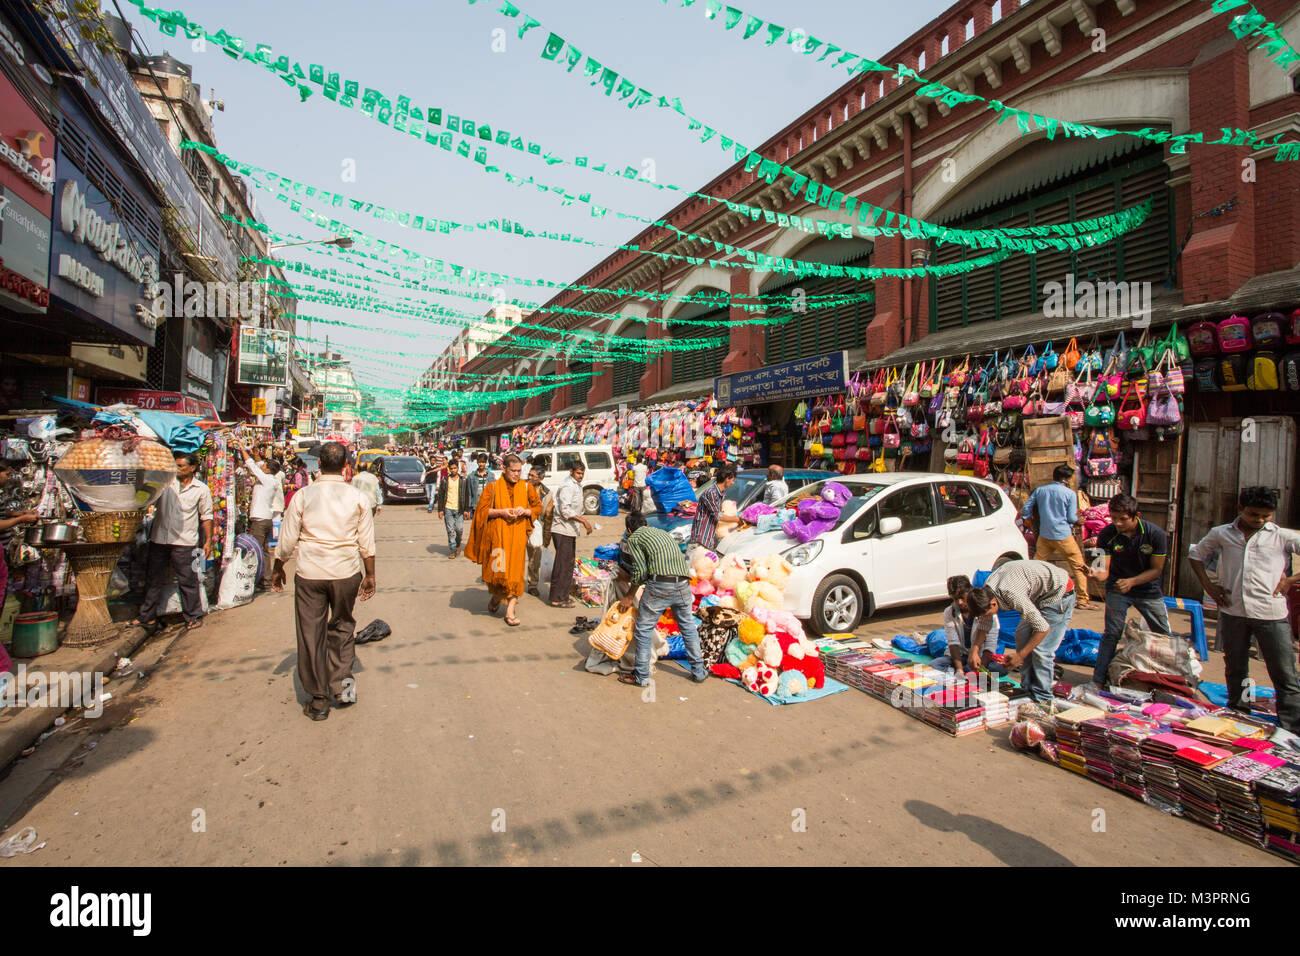 A Street Market in Kolkata, India - Stock Image